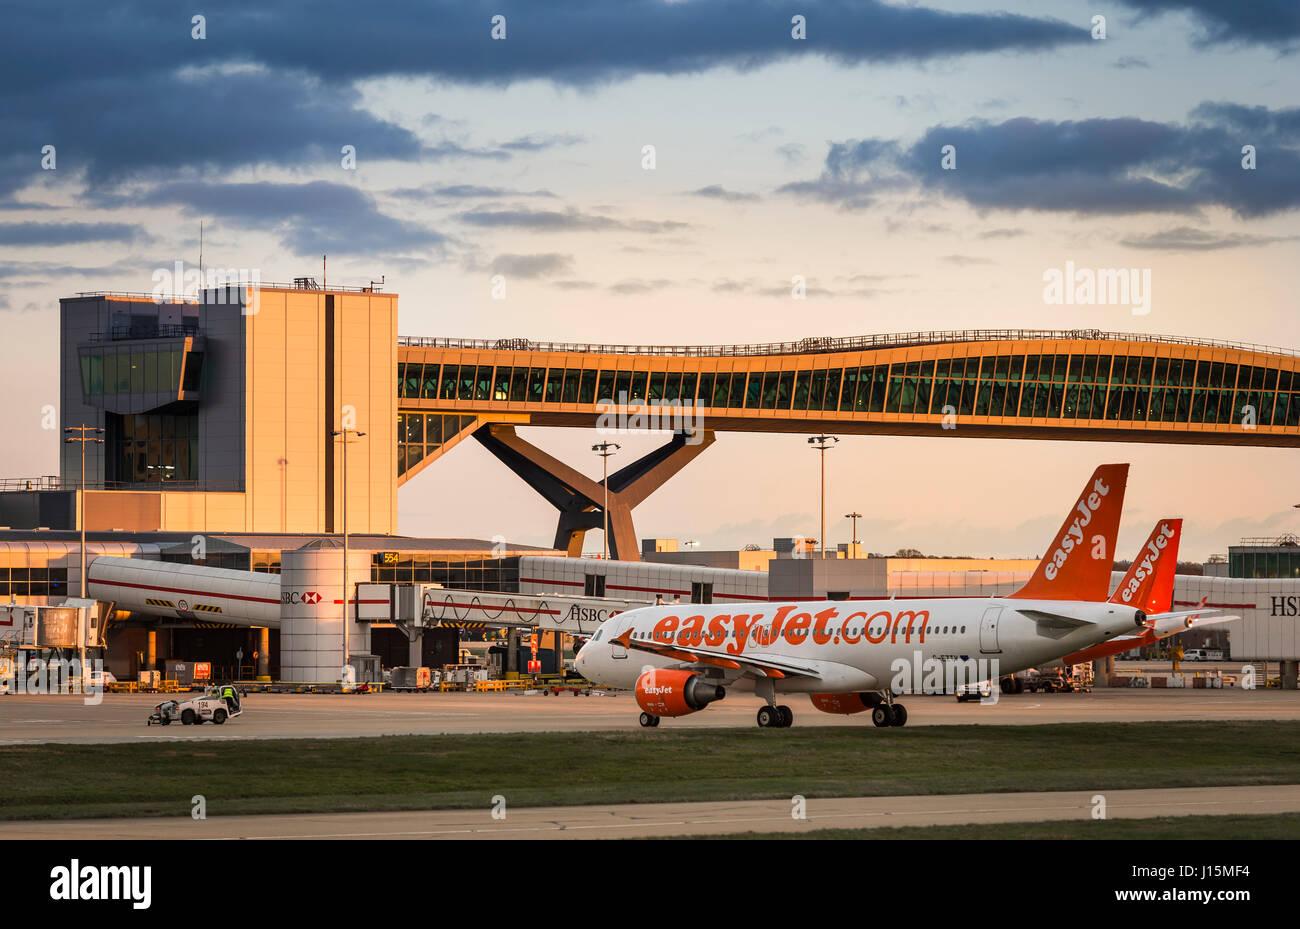 Easyjet plane waiting on the apron at Gatwick airport, near London, United Kingdom. - Stock Image